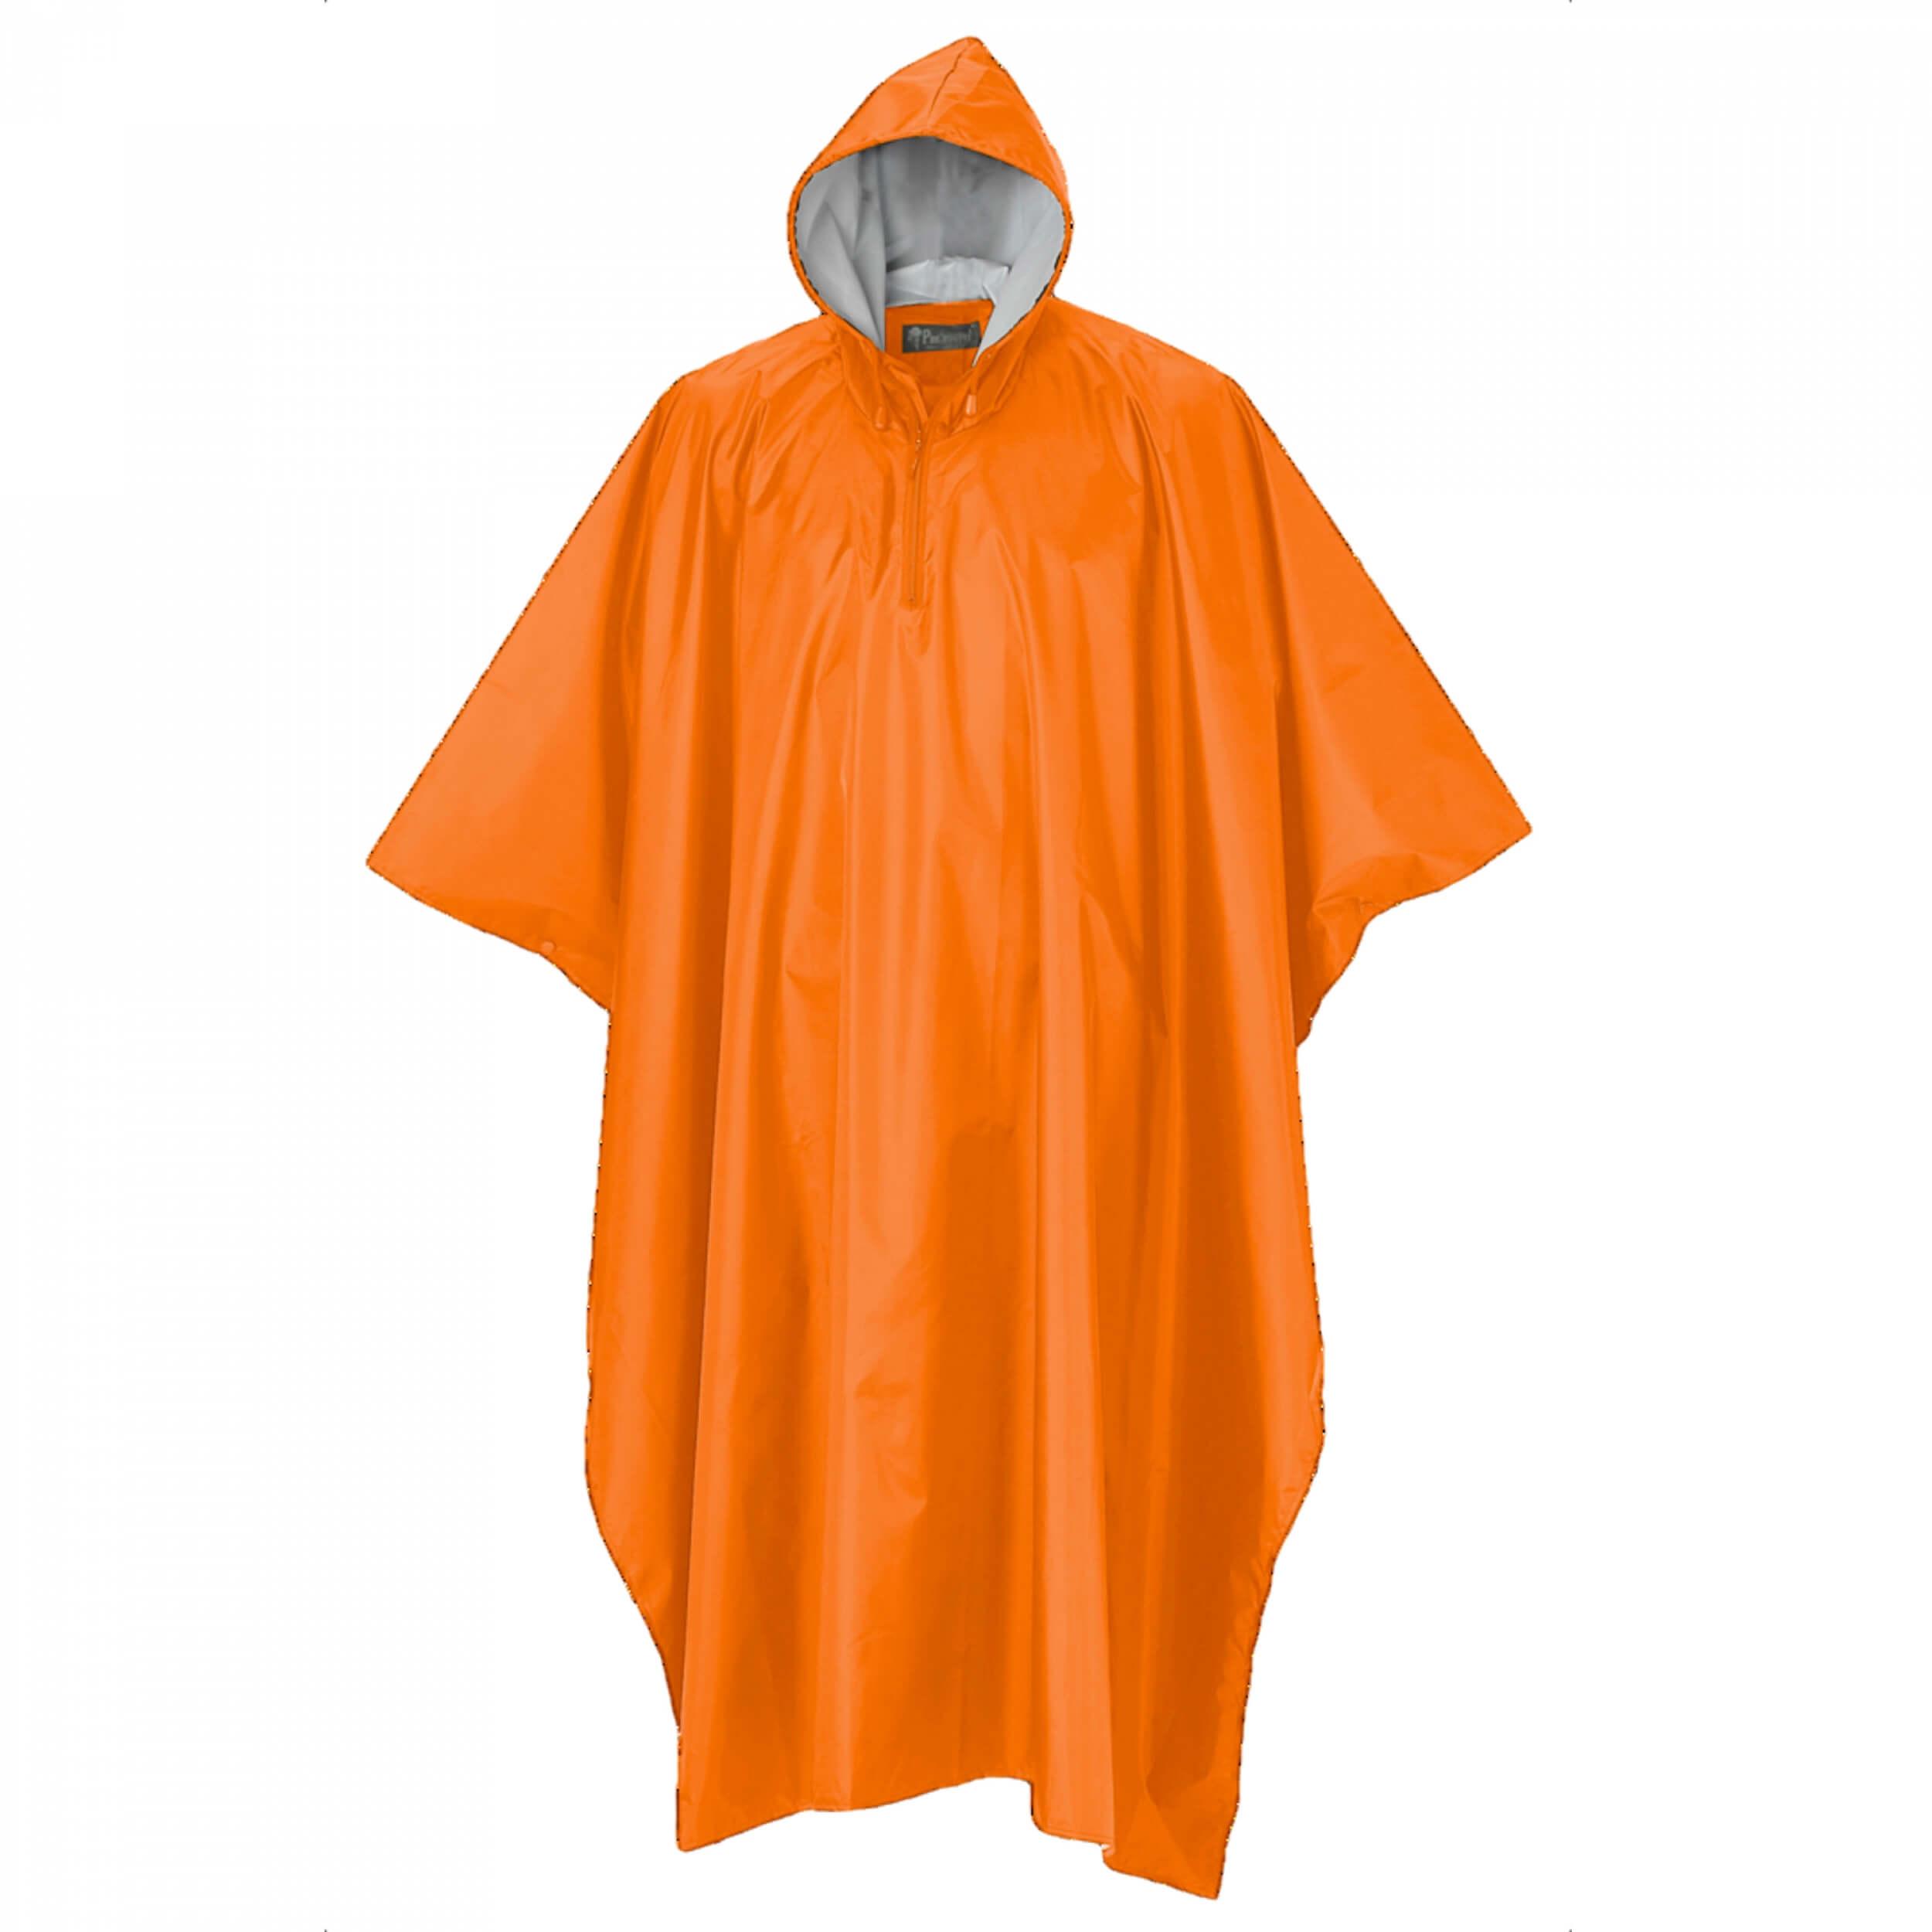 Pinewood Rainfall Poncho orange